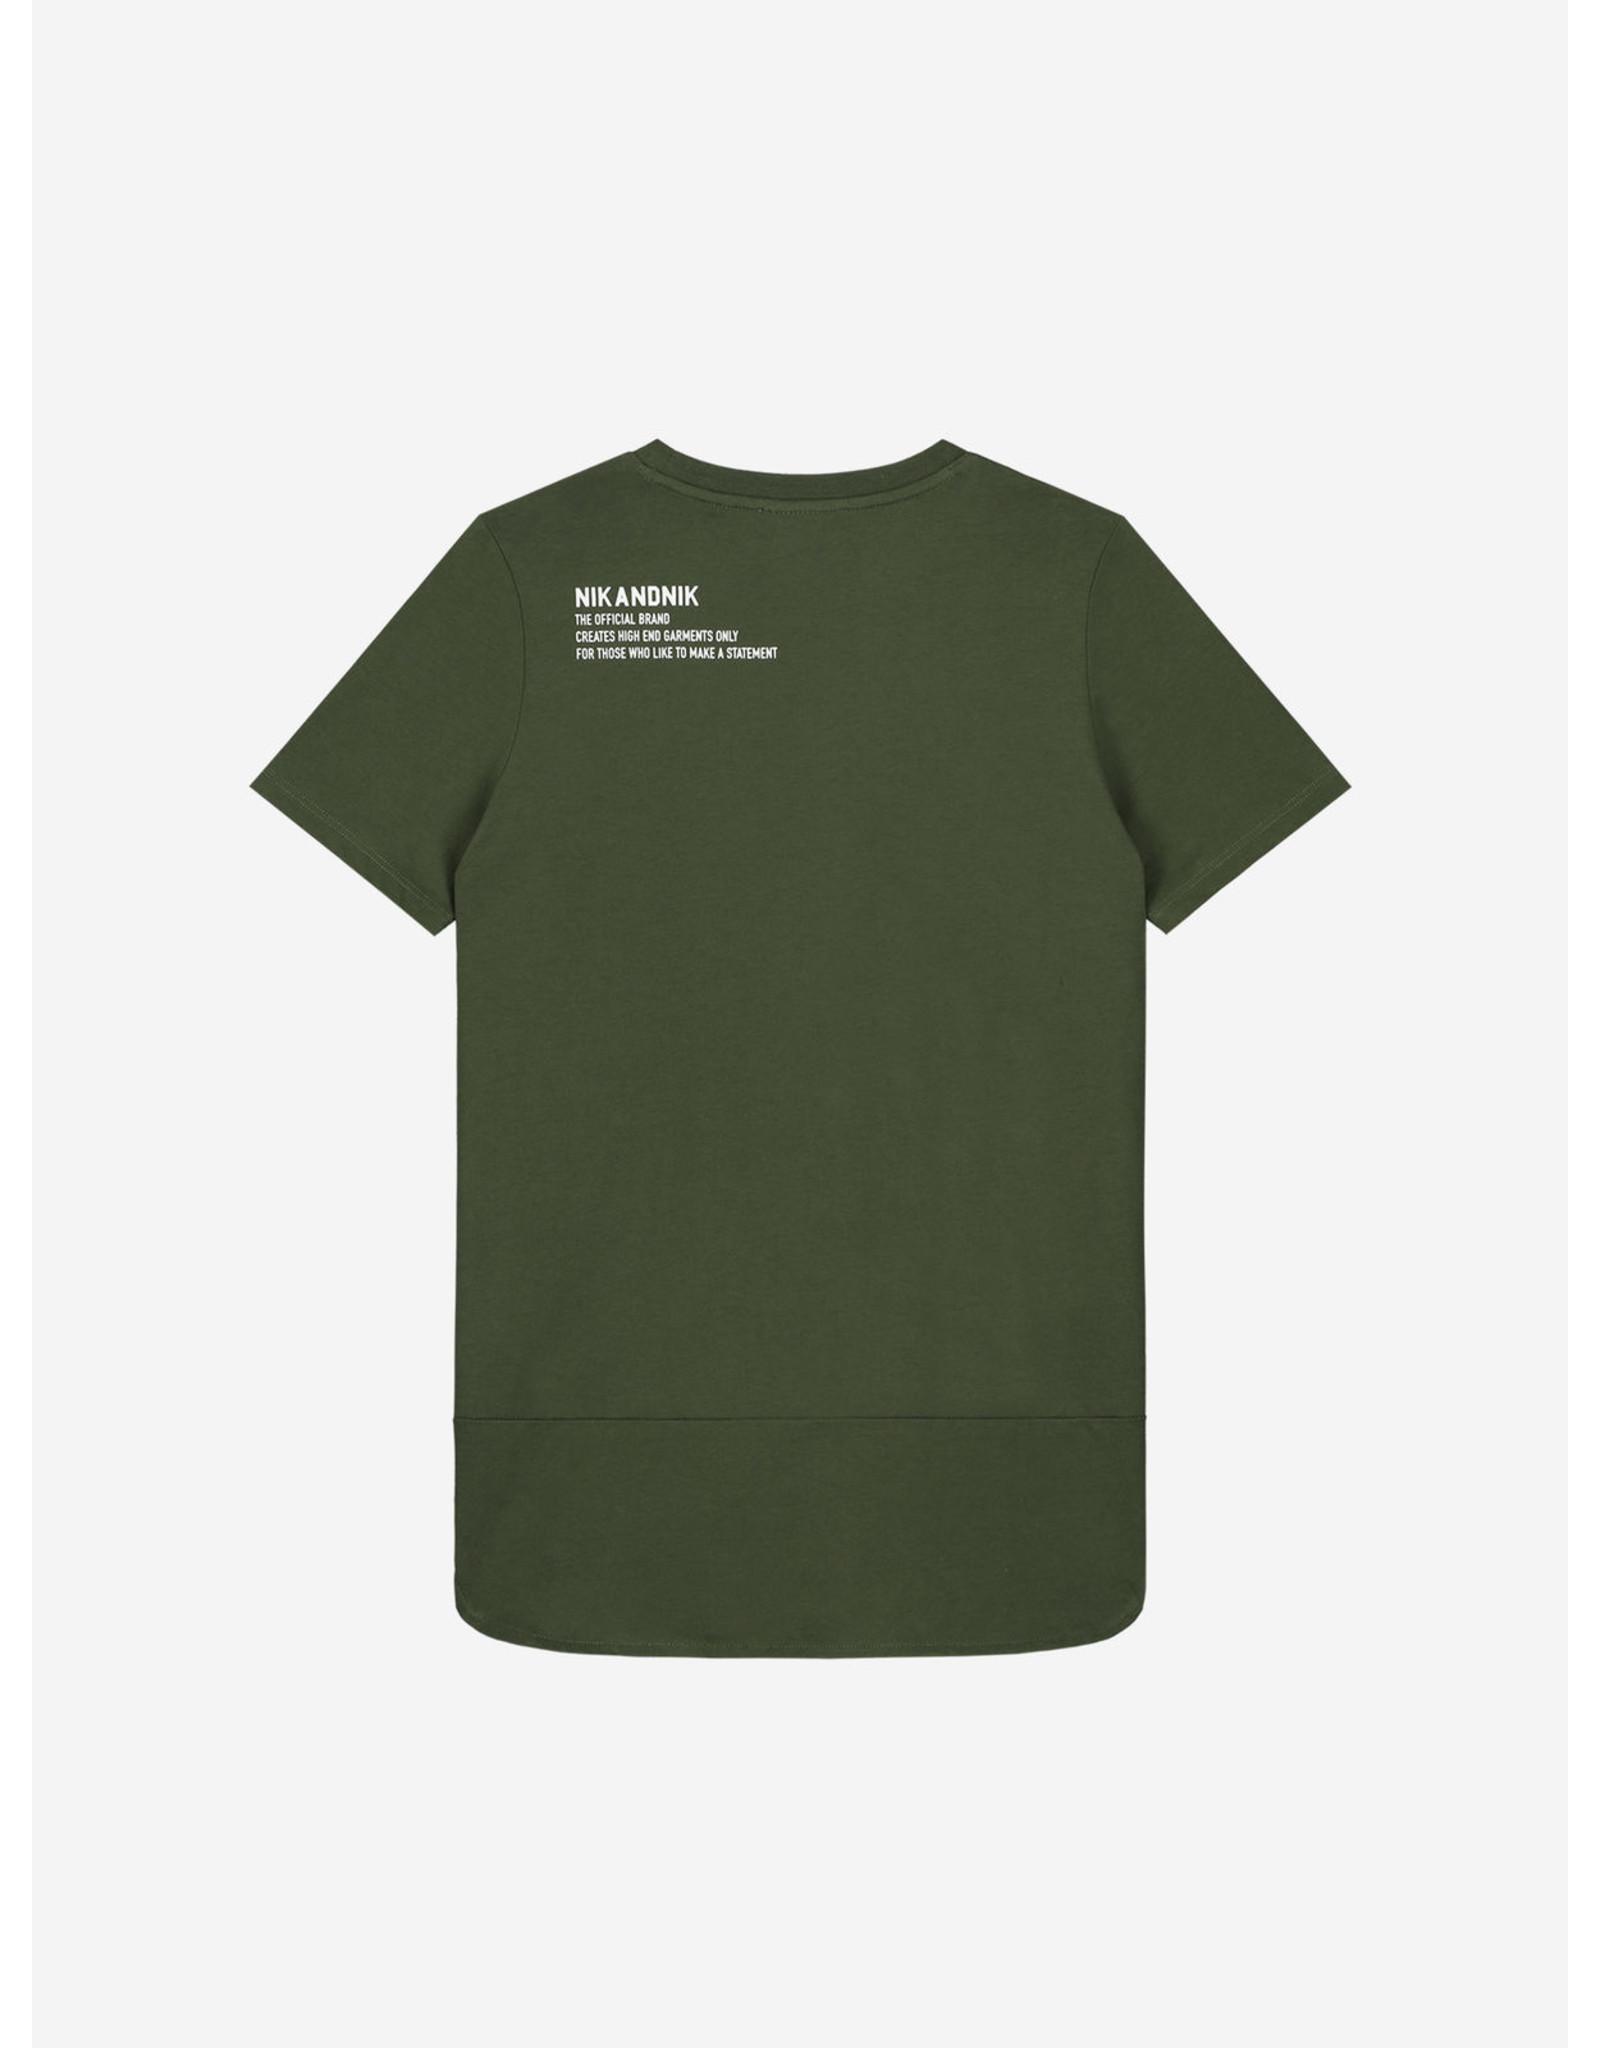 Nik&Nik NIK&NIK Unique T-shirt Dark Moss Green